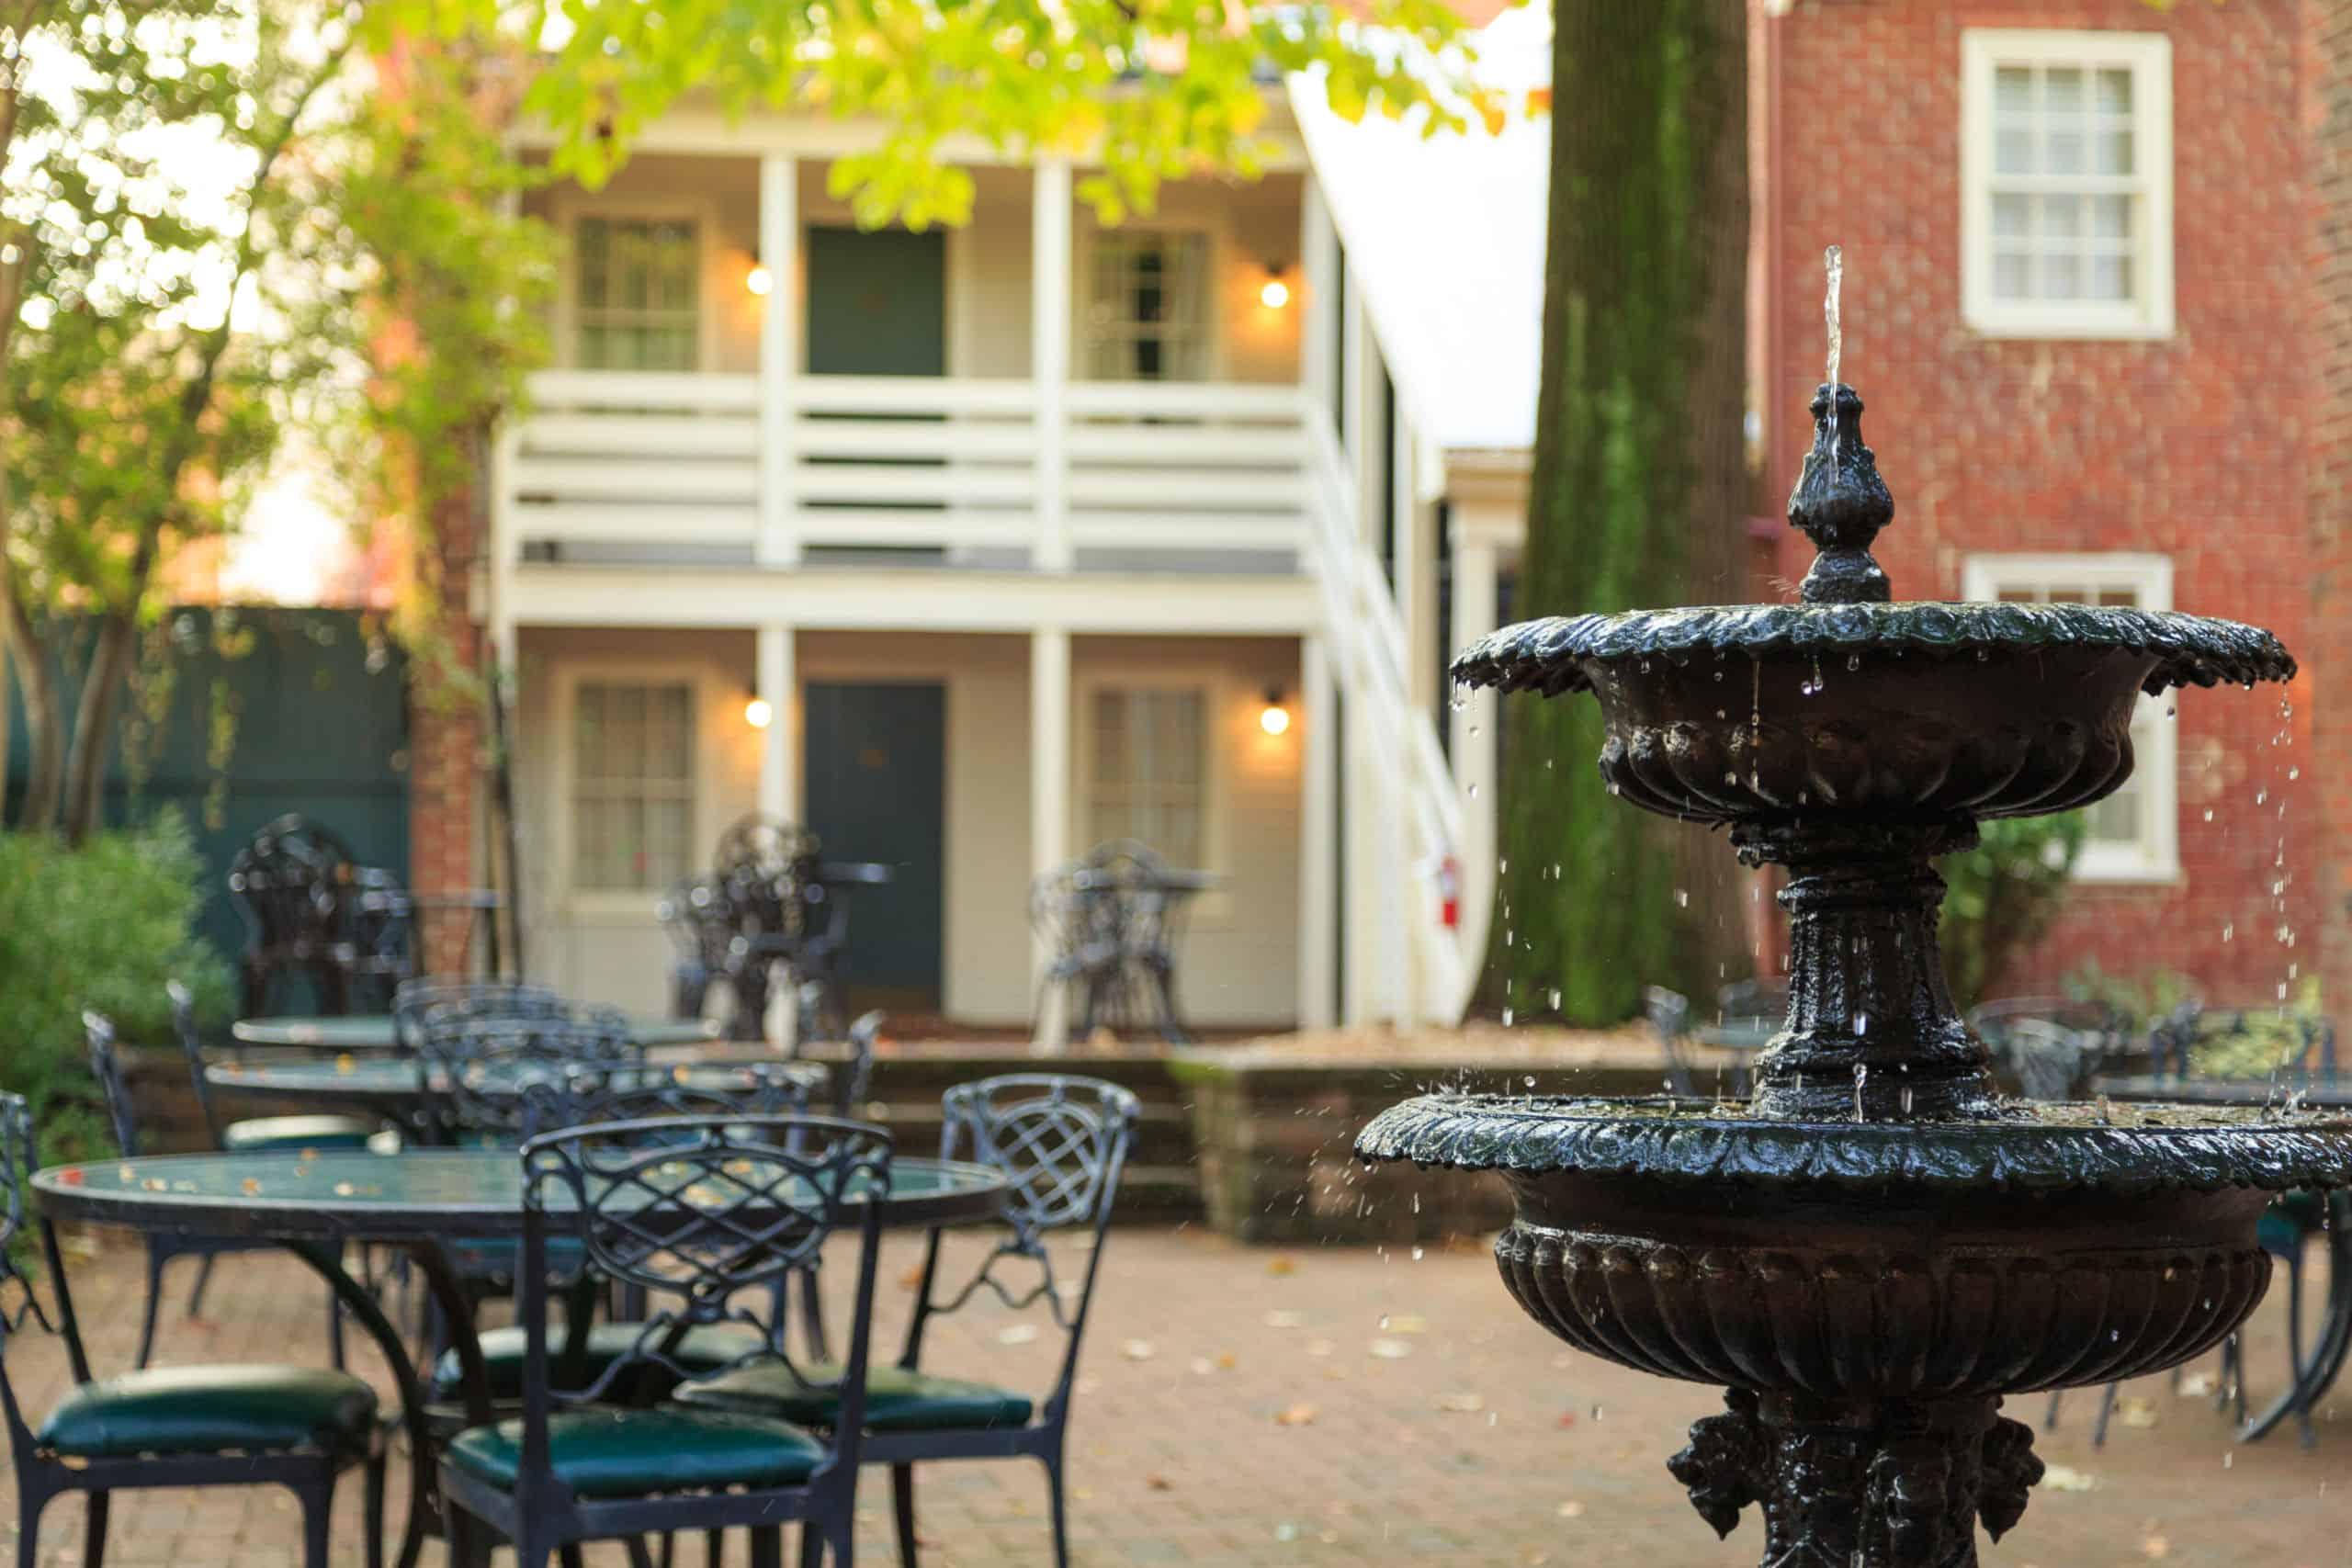 Courtyard at Linden Row Inn